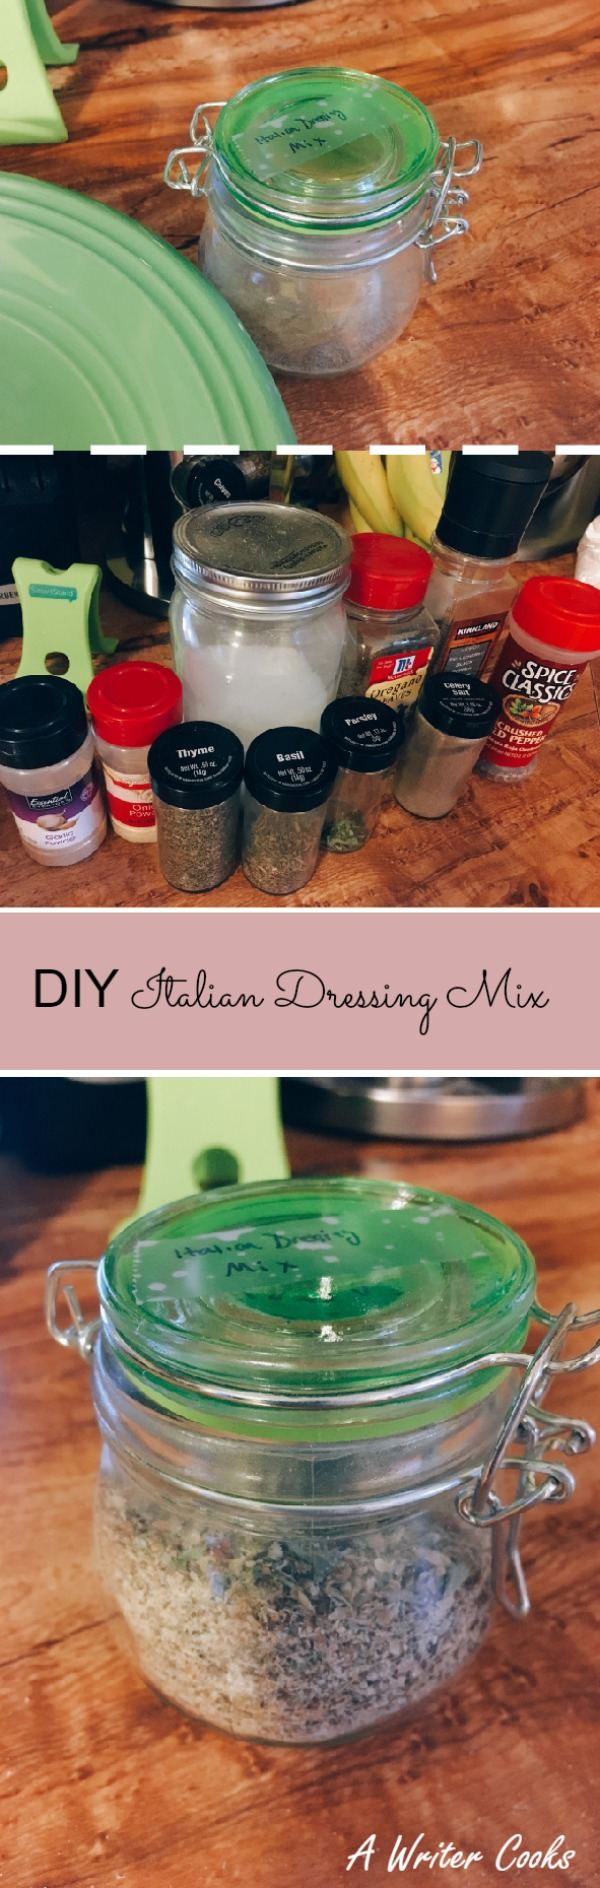 DIY Italian Dressing Mix with Chicken Recipe